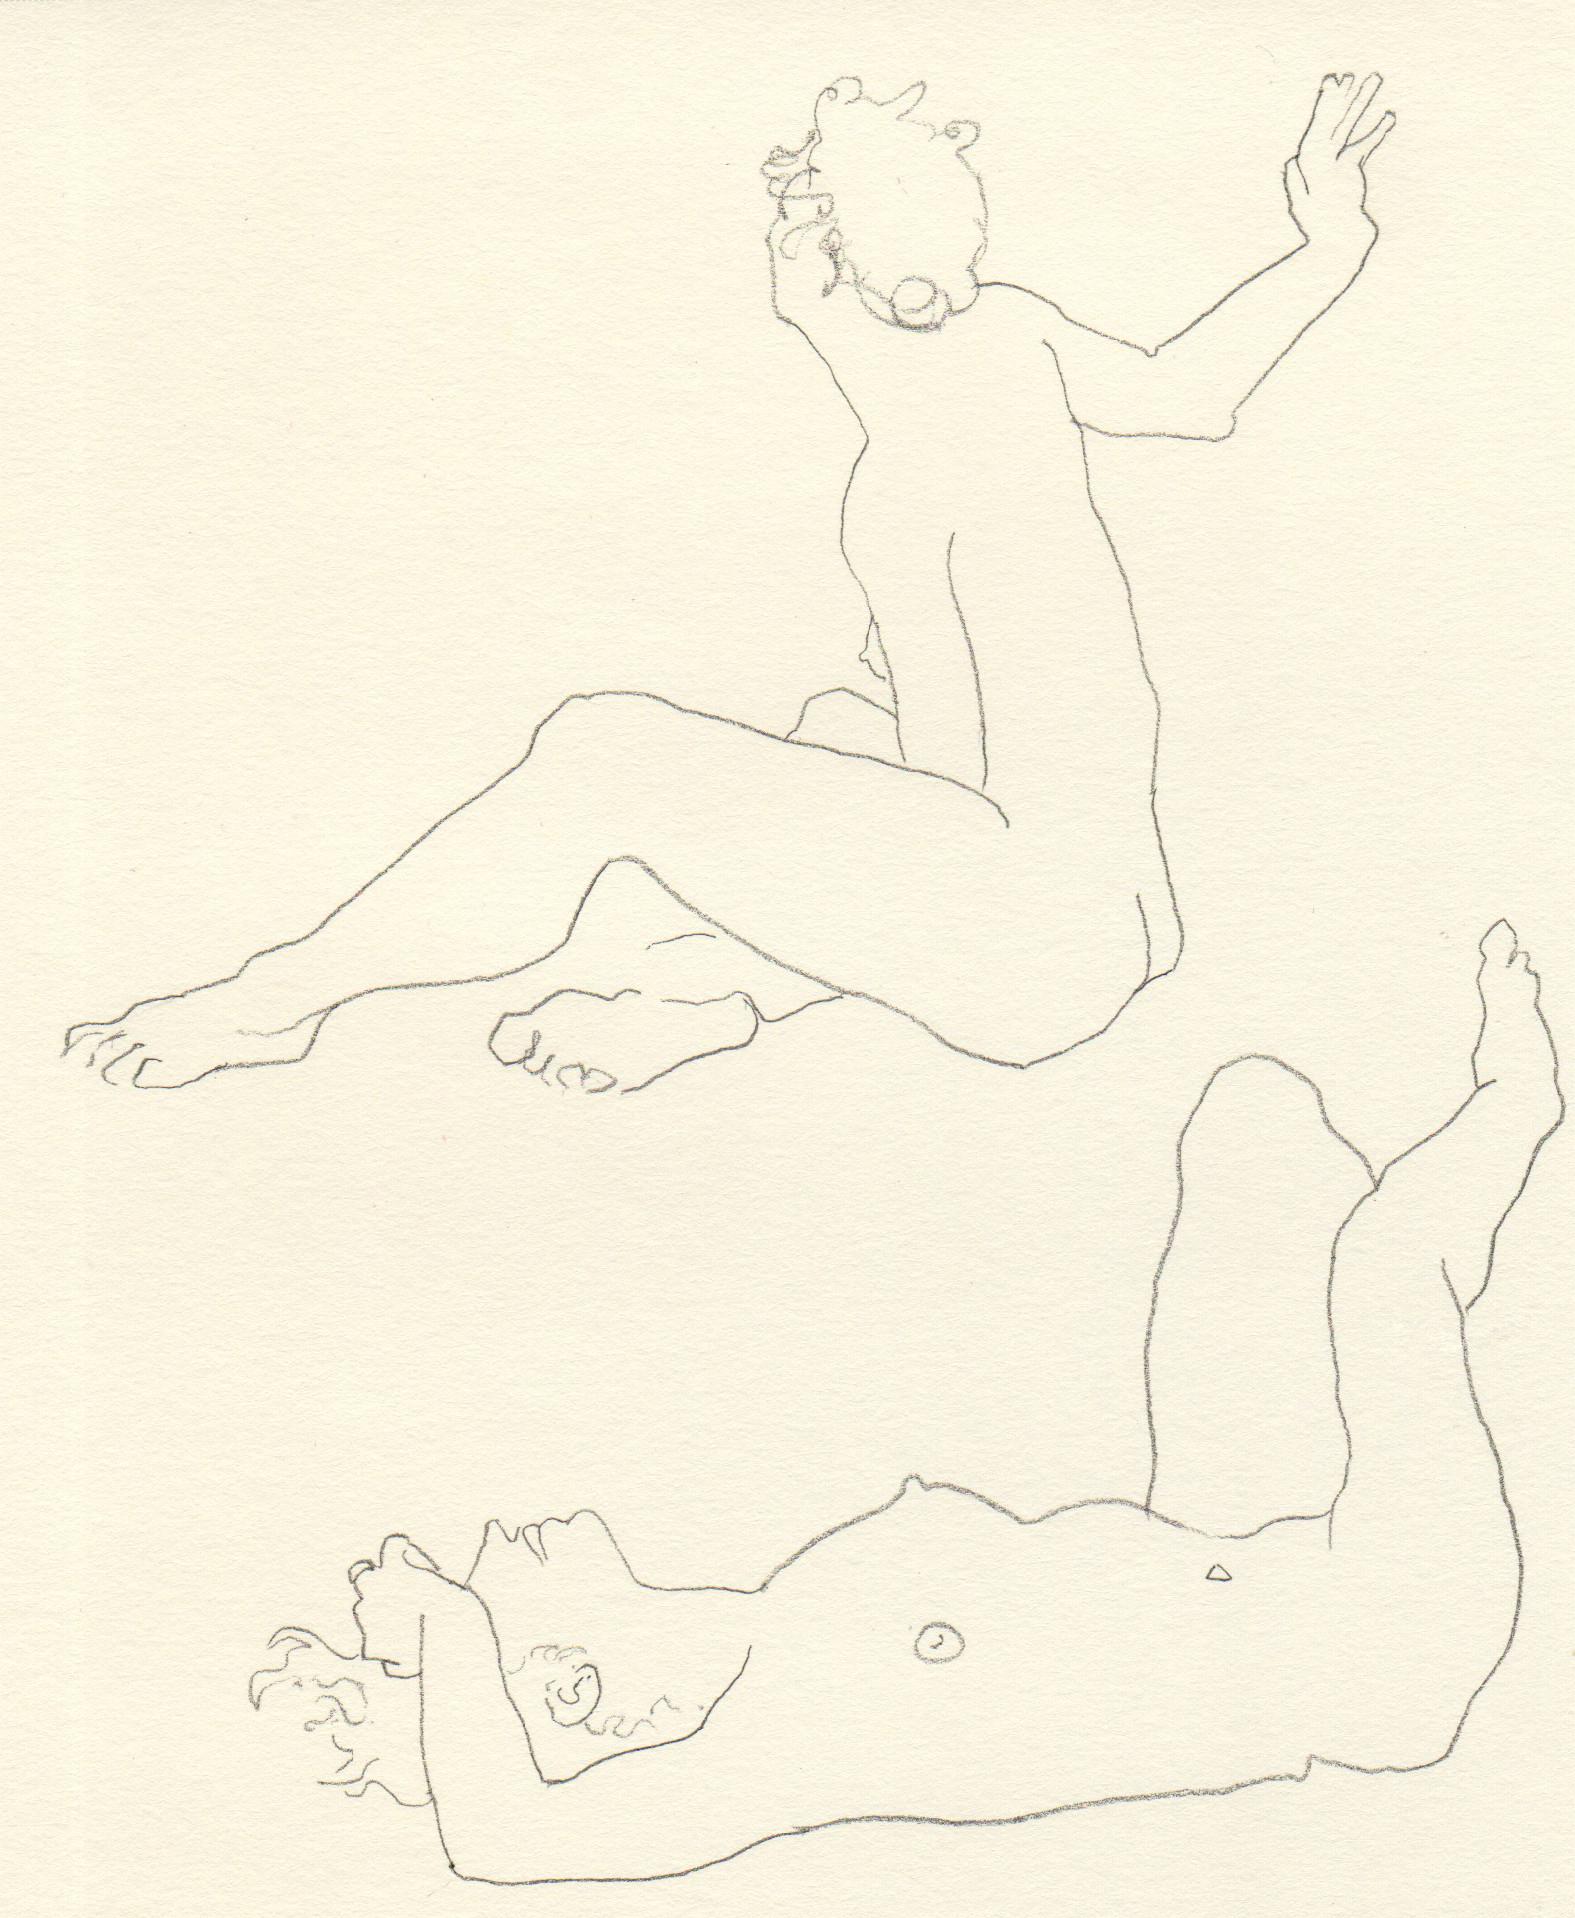 2014_Sketch_F-Beudin_07